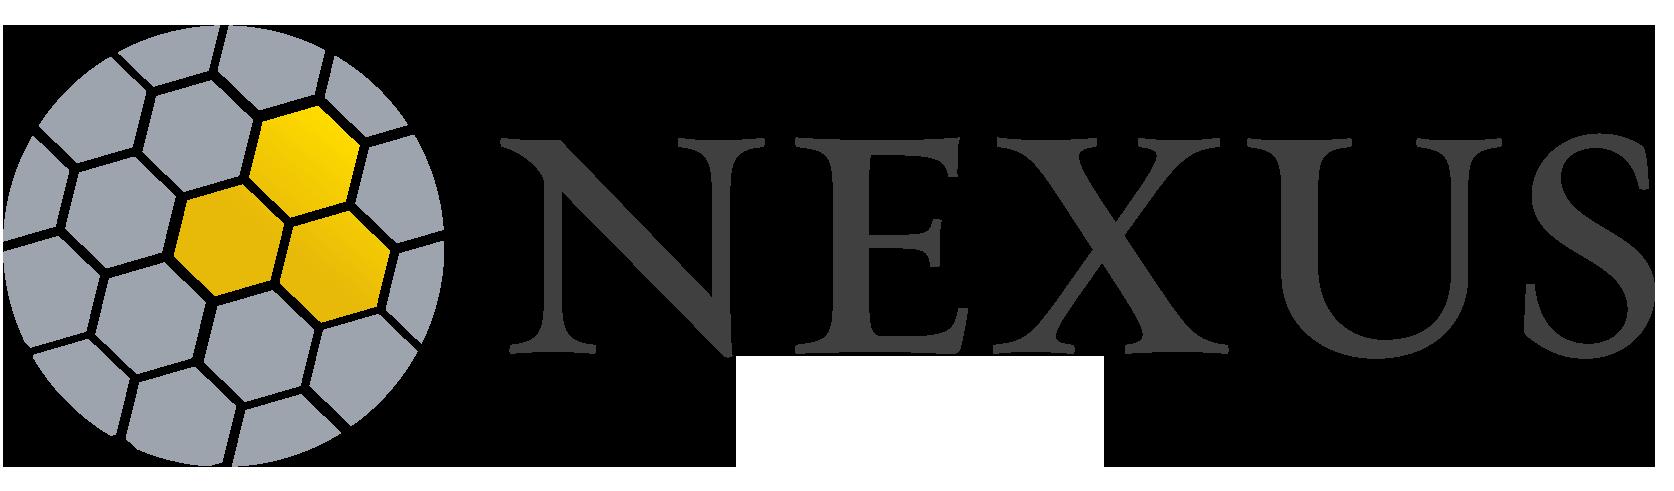 NEXUS_Global_Logo-1.png